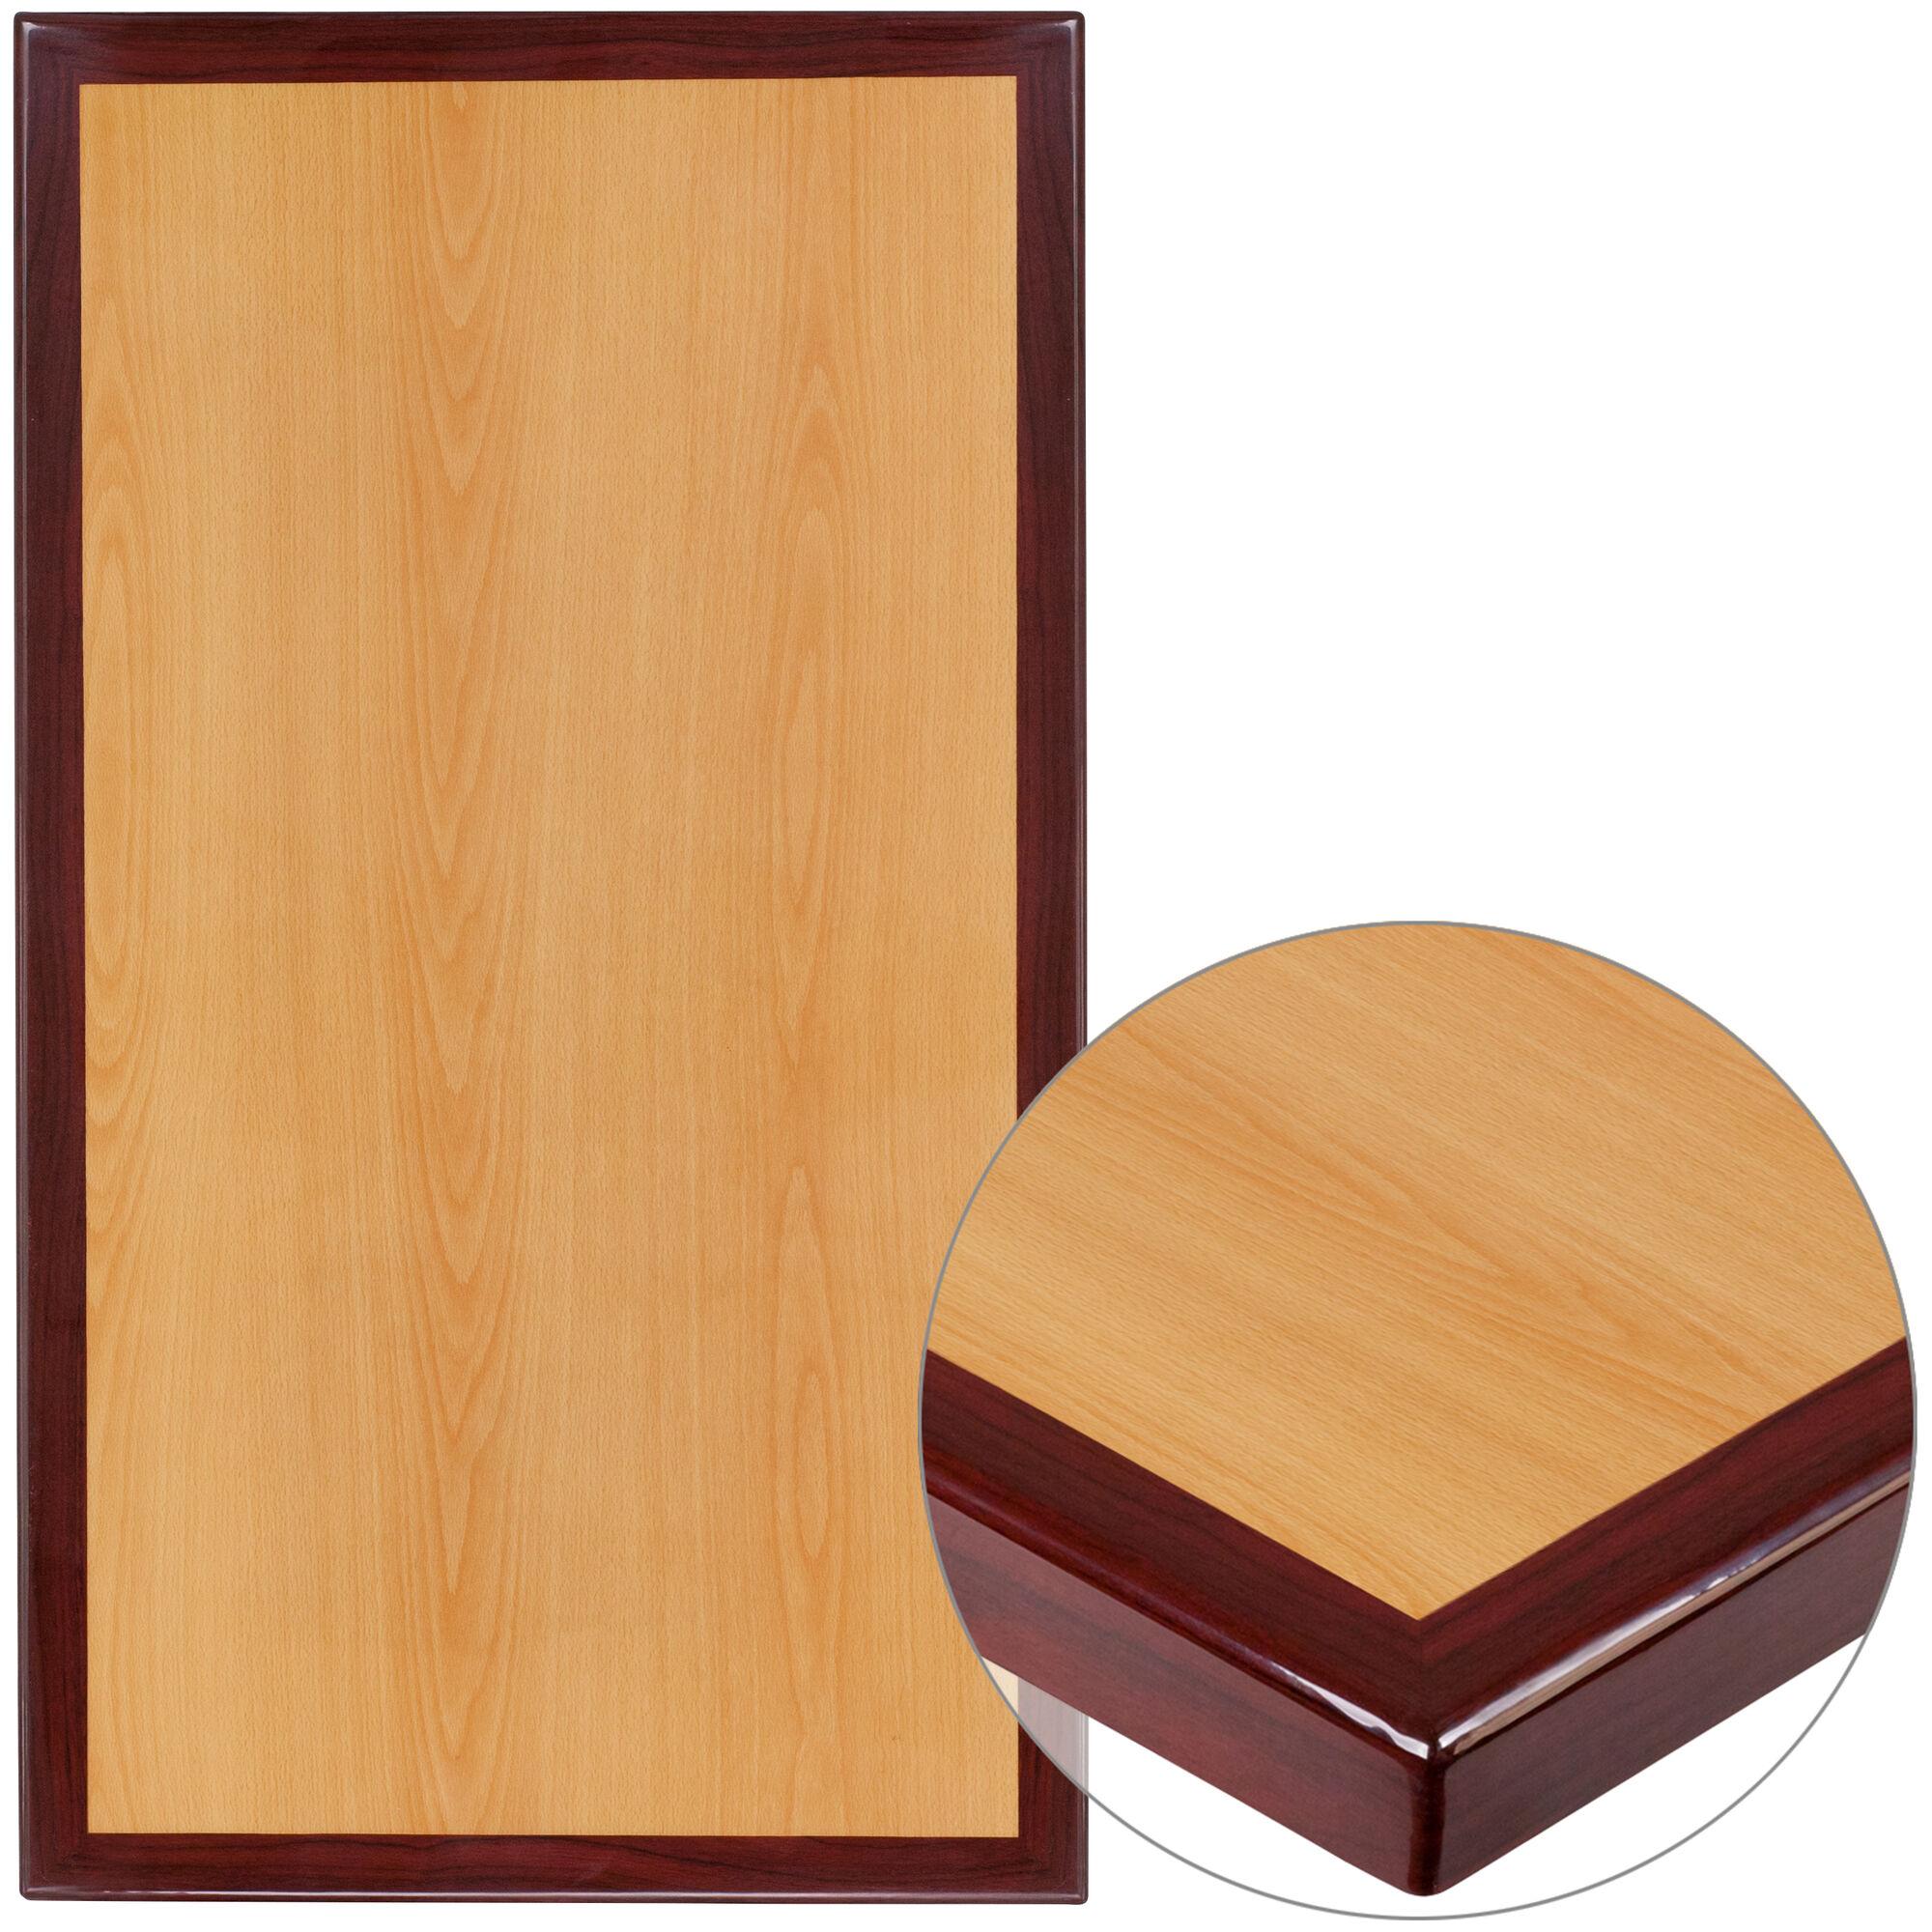 "8"" x 8"" Rectangular 8-Tone High-Gloss Cherry Resin Table Top with 8""  Thick Mahogany Edge"